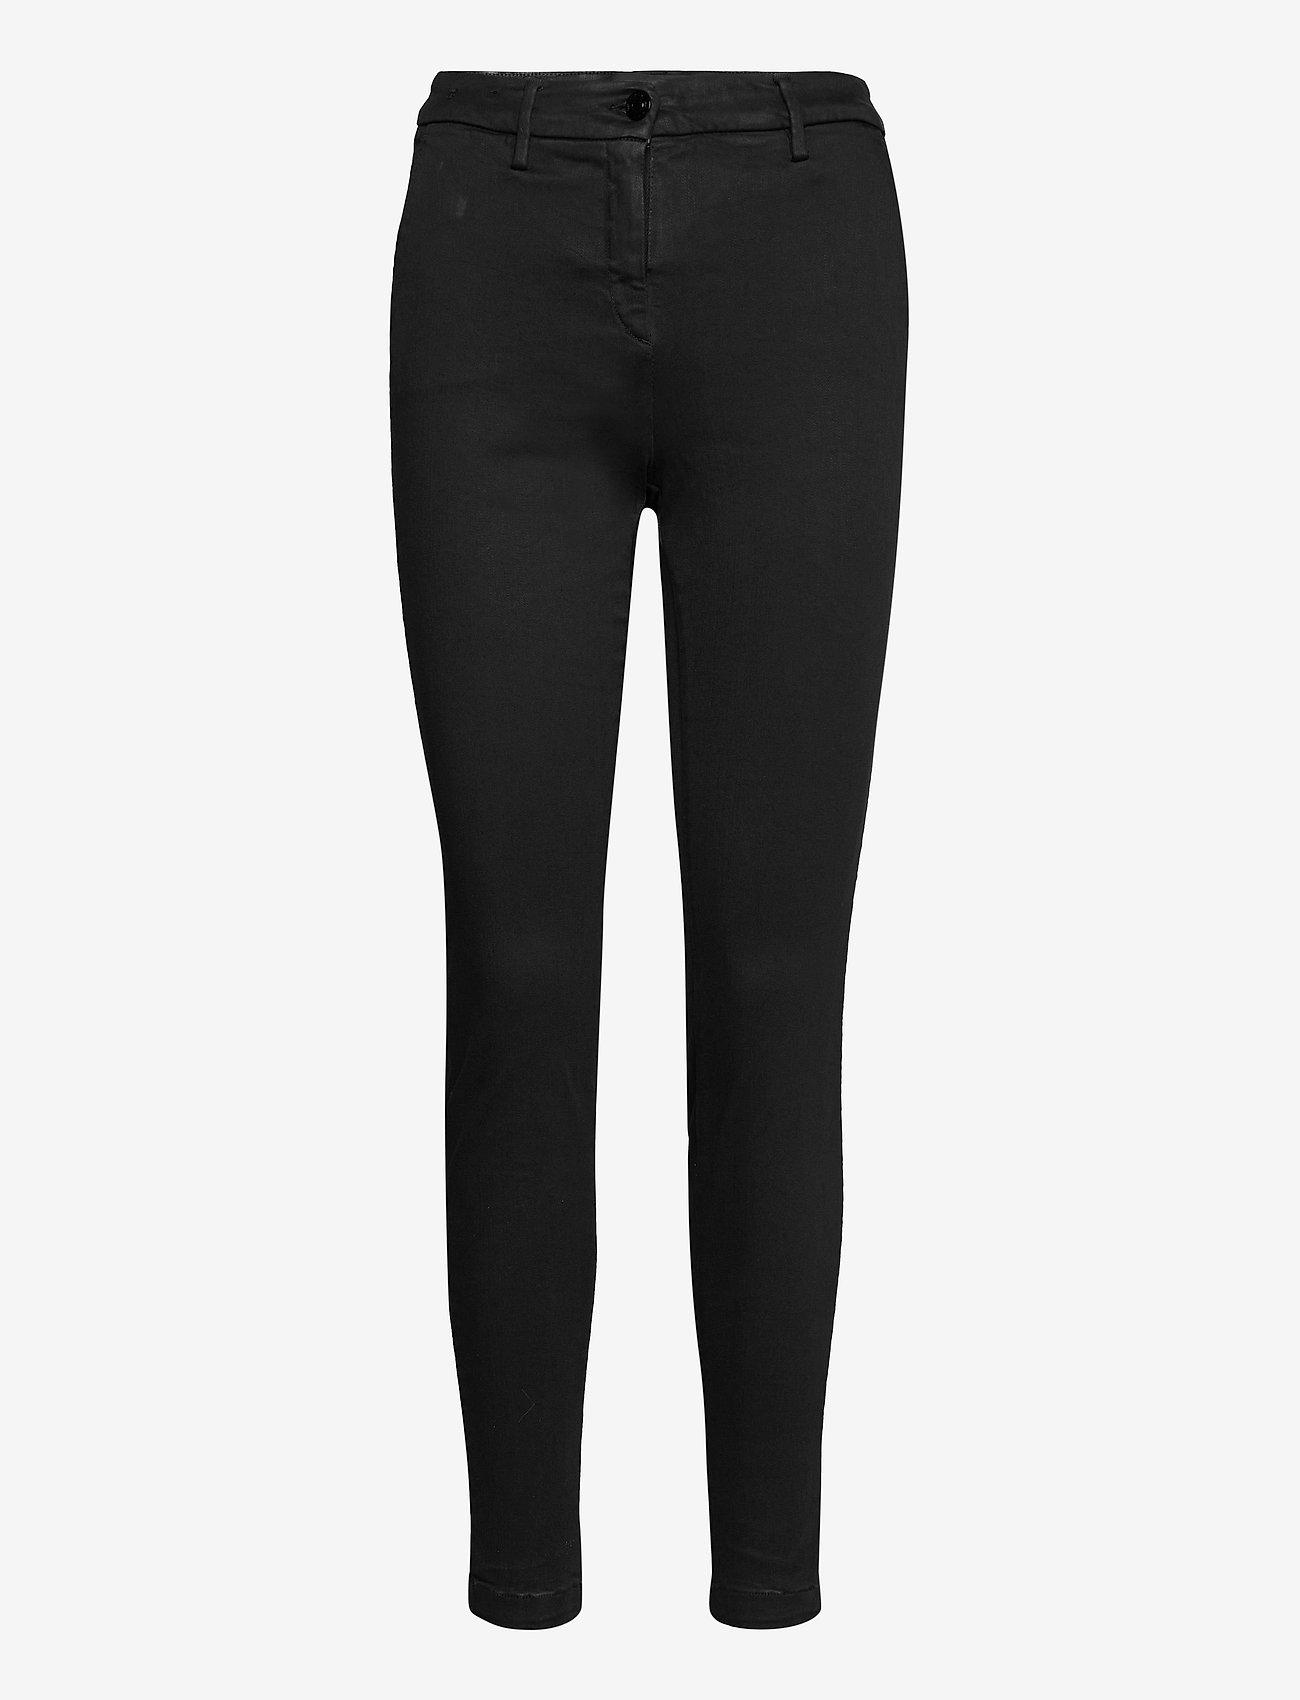 Replay - LYSA HYPERFLEX - slim jeans - black. - 0